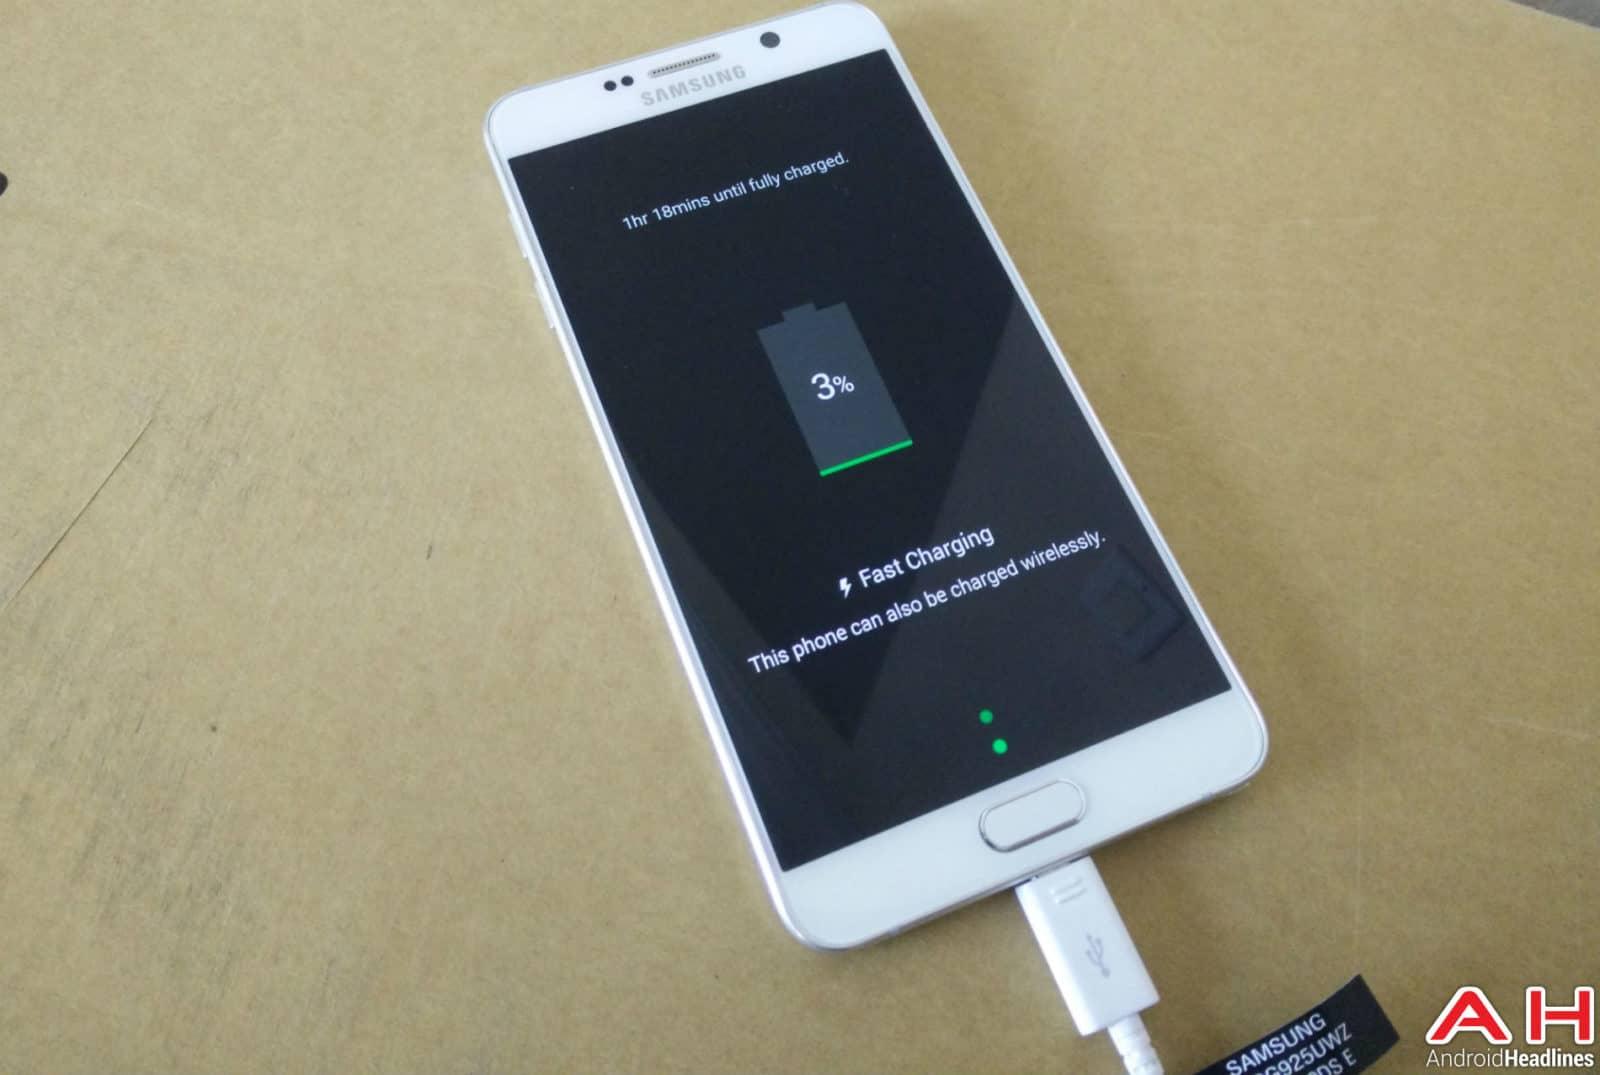 Samsung Galaxy Note 5 Charging AH